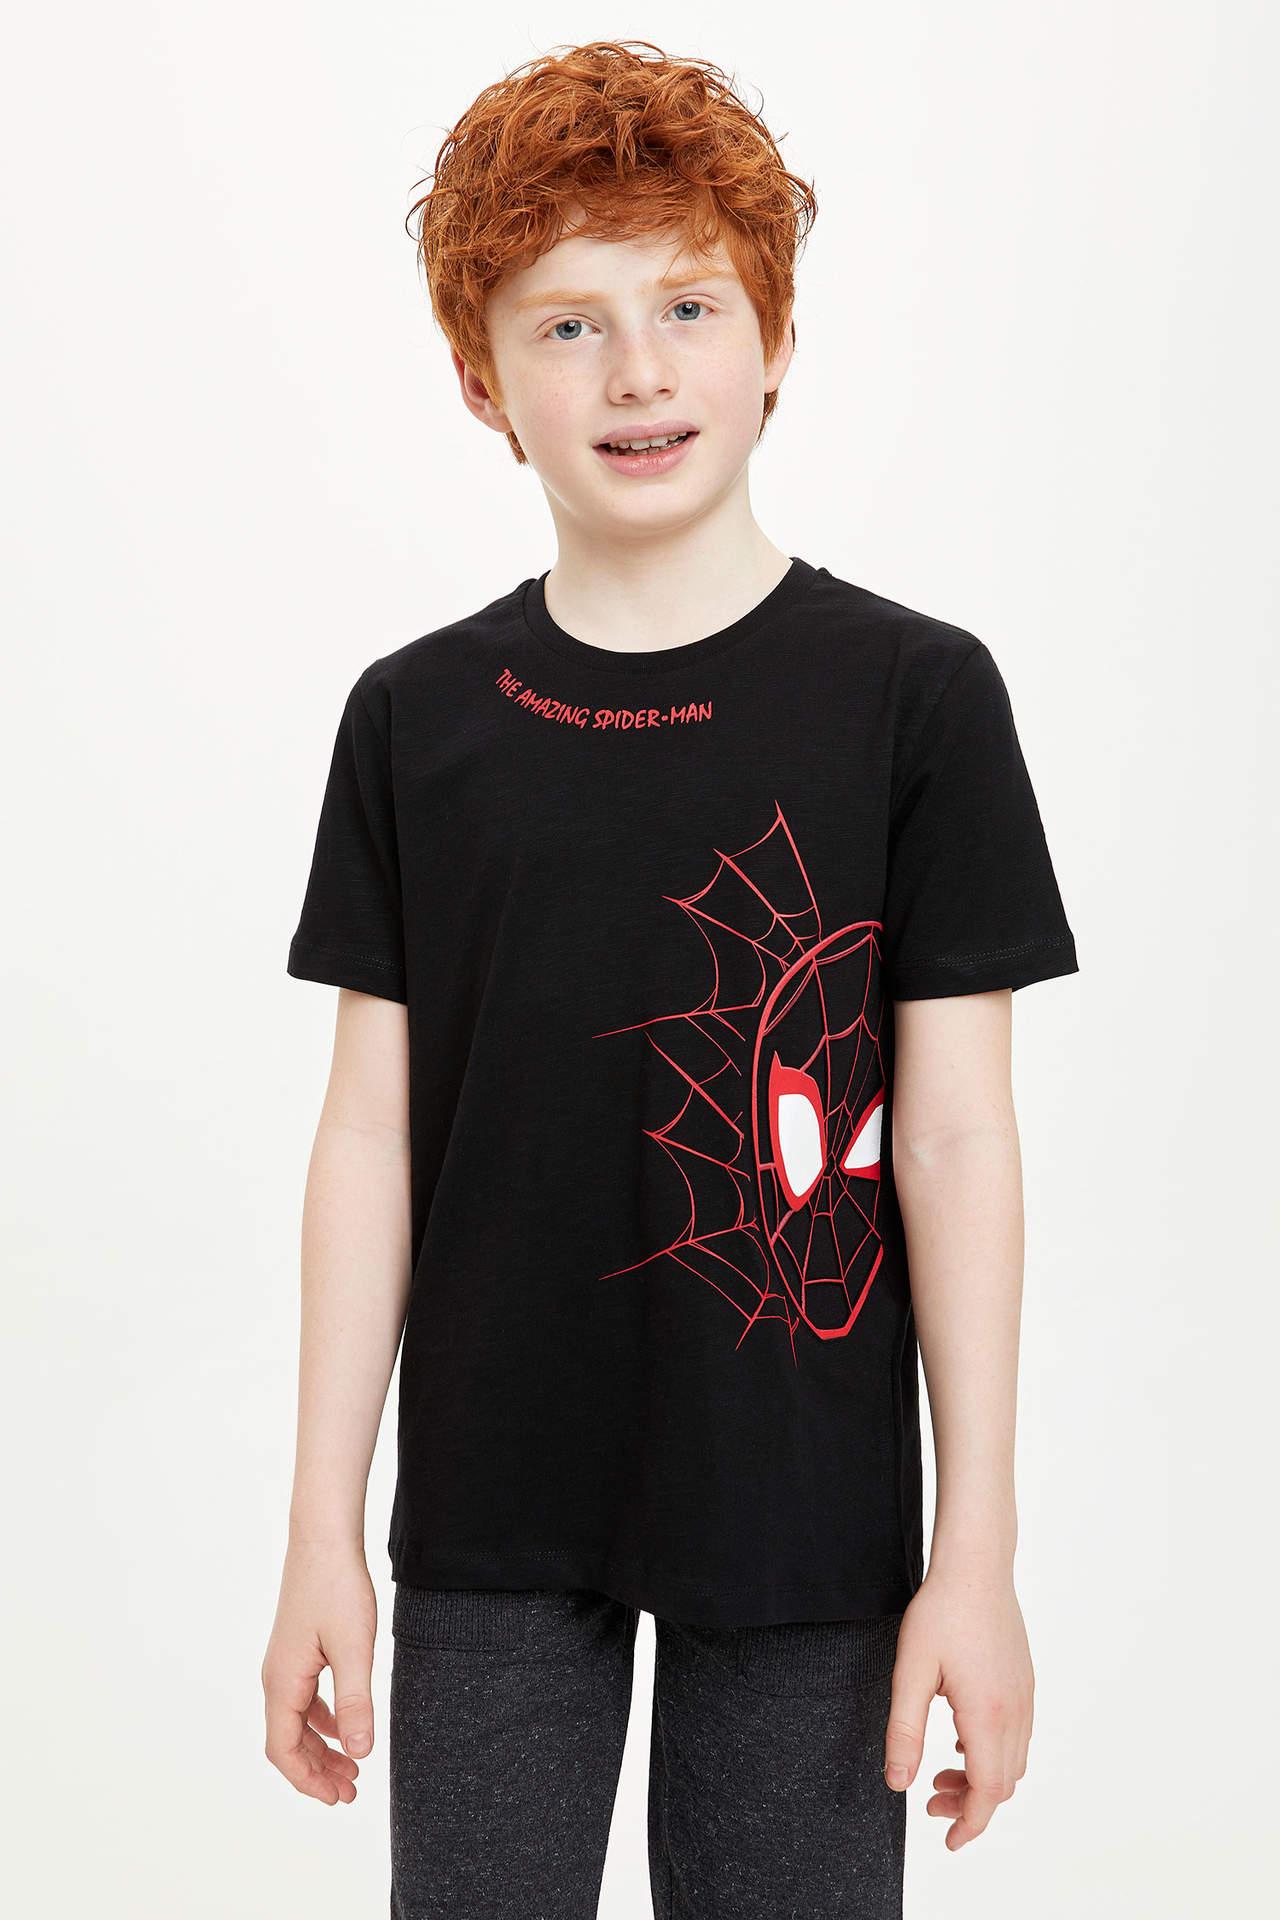 DeFacto Erkek Çocuk Spider-Man Lisanslı Kısa Kollu Tshirt Siyah male